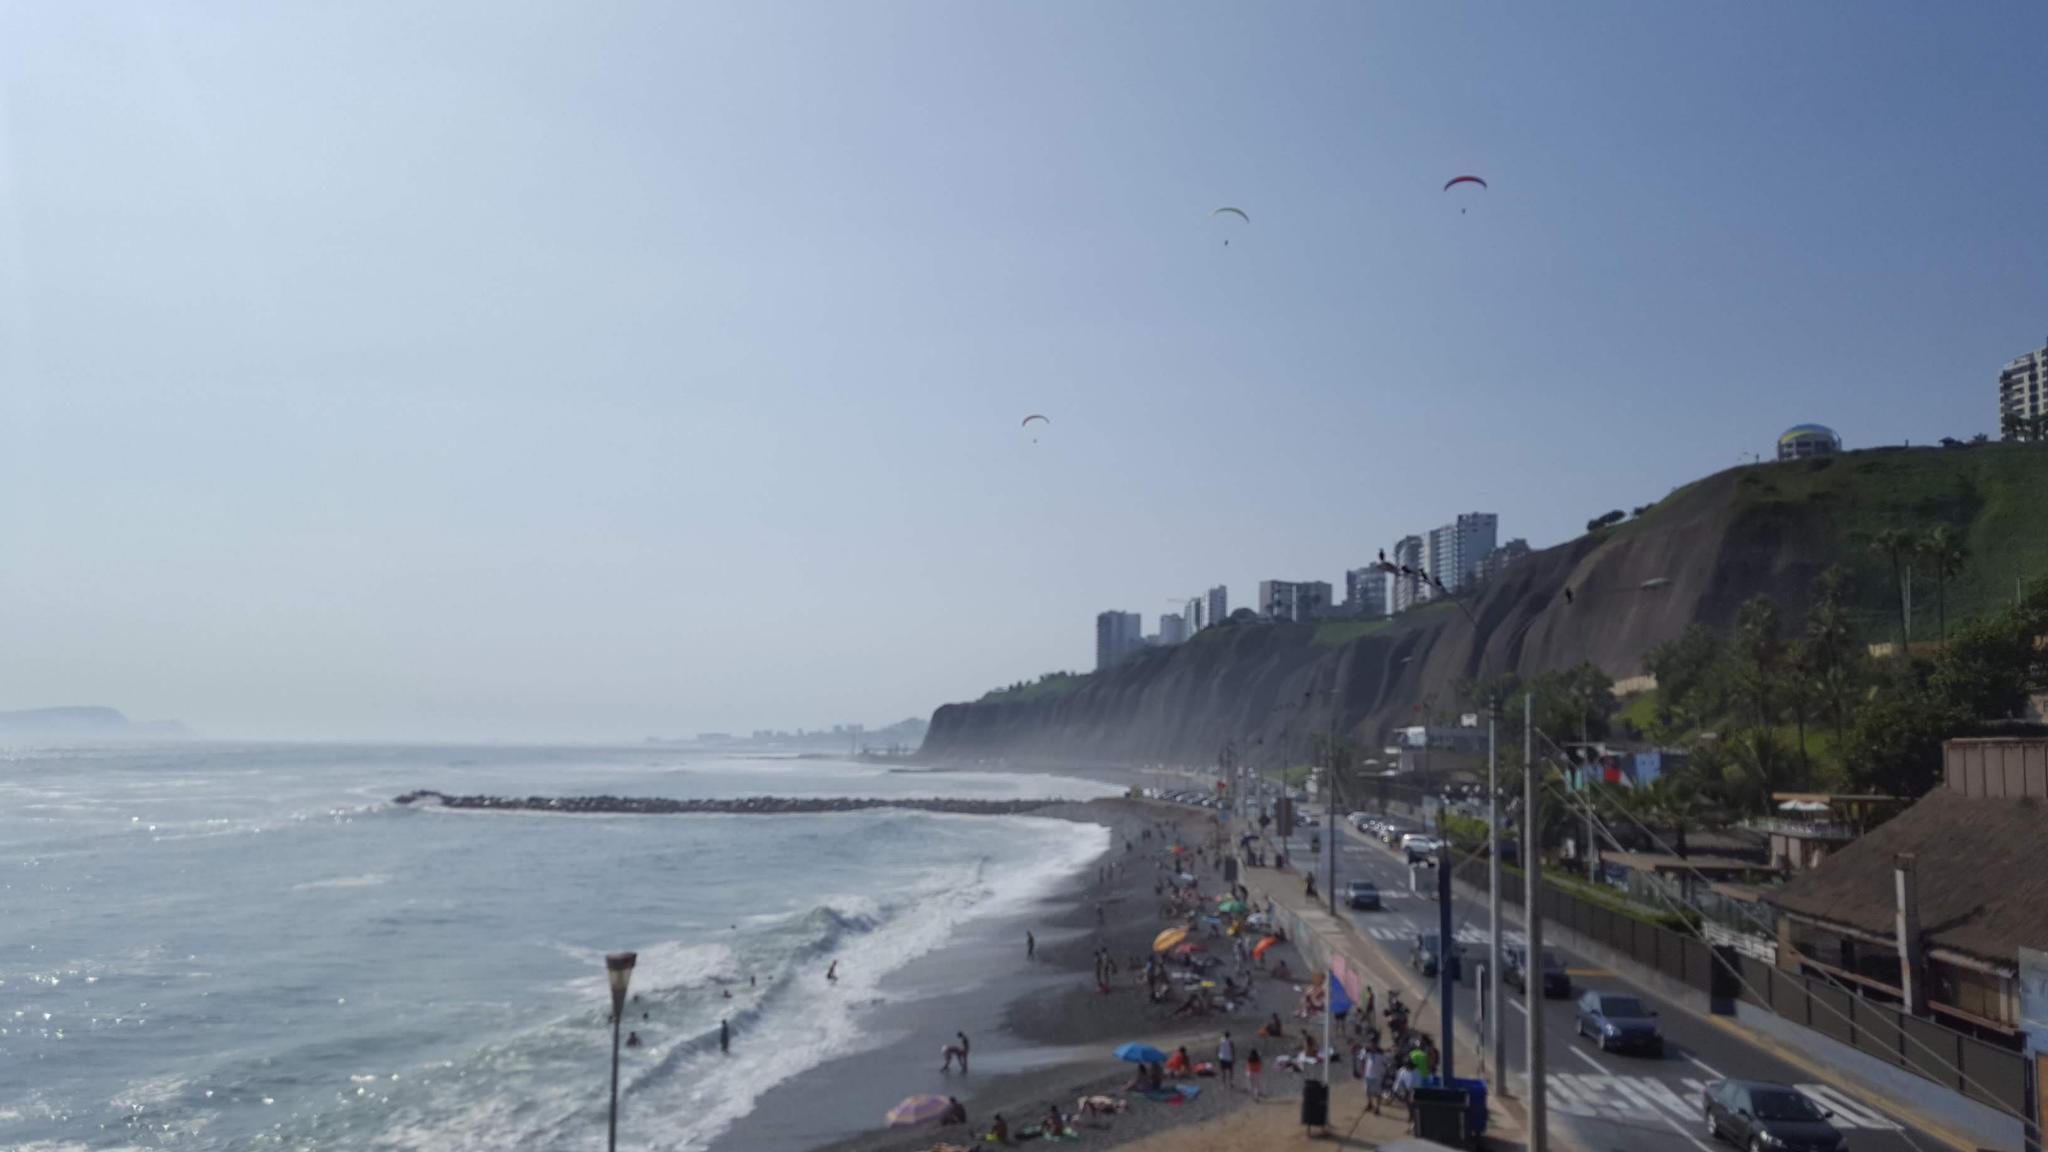 Peru: Lima, Cusco and Machu Picchu-lima-surfer-hand-jpg